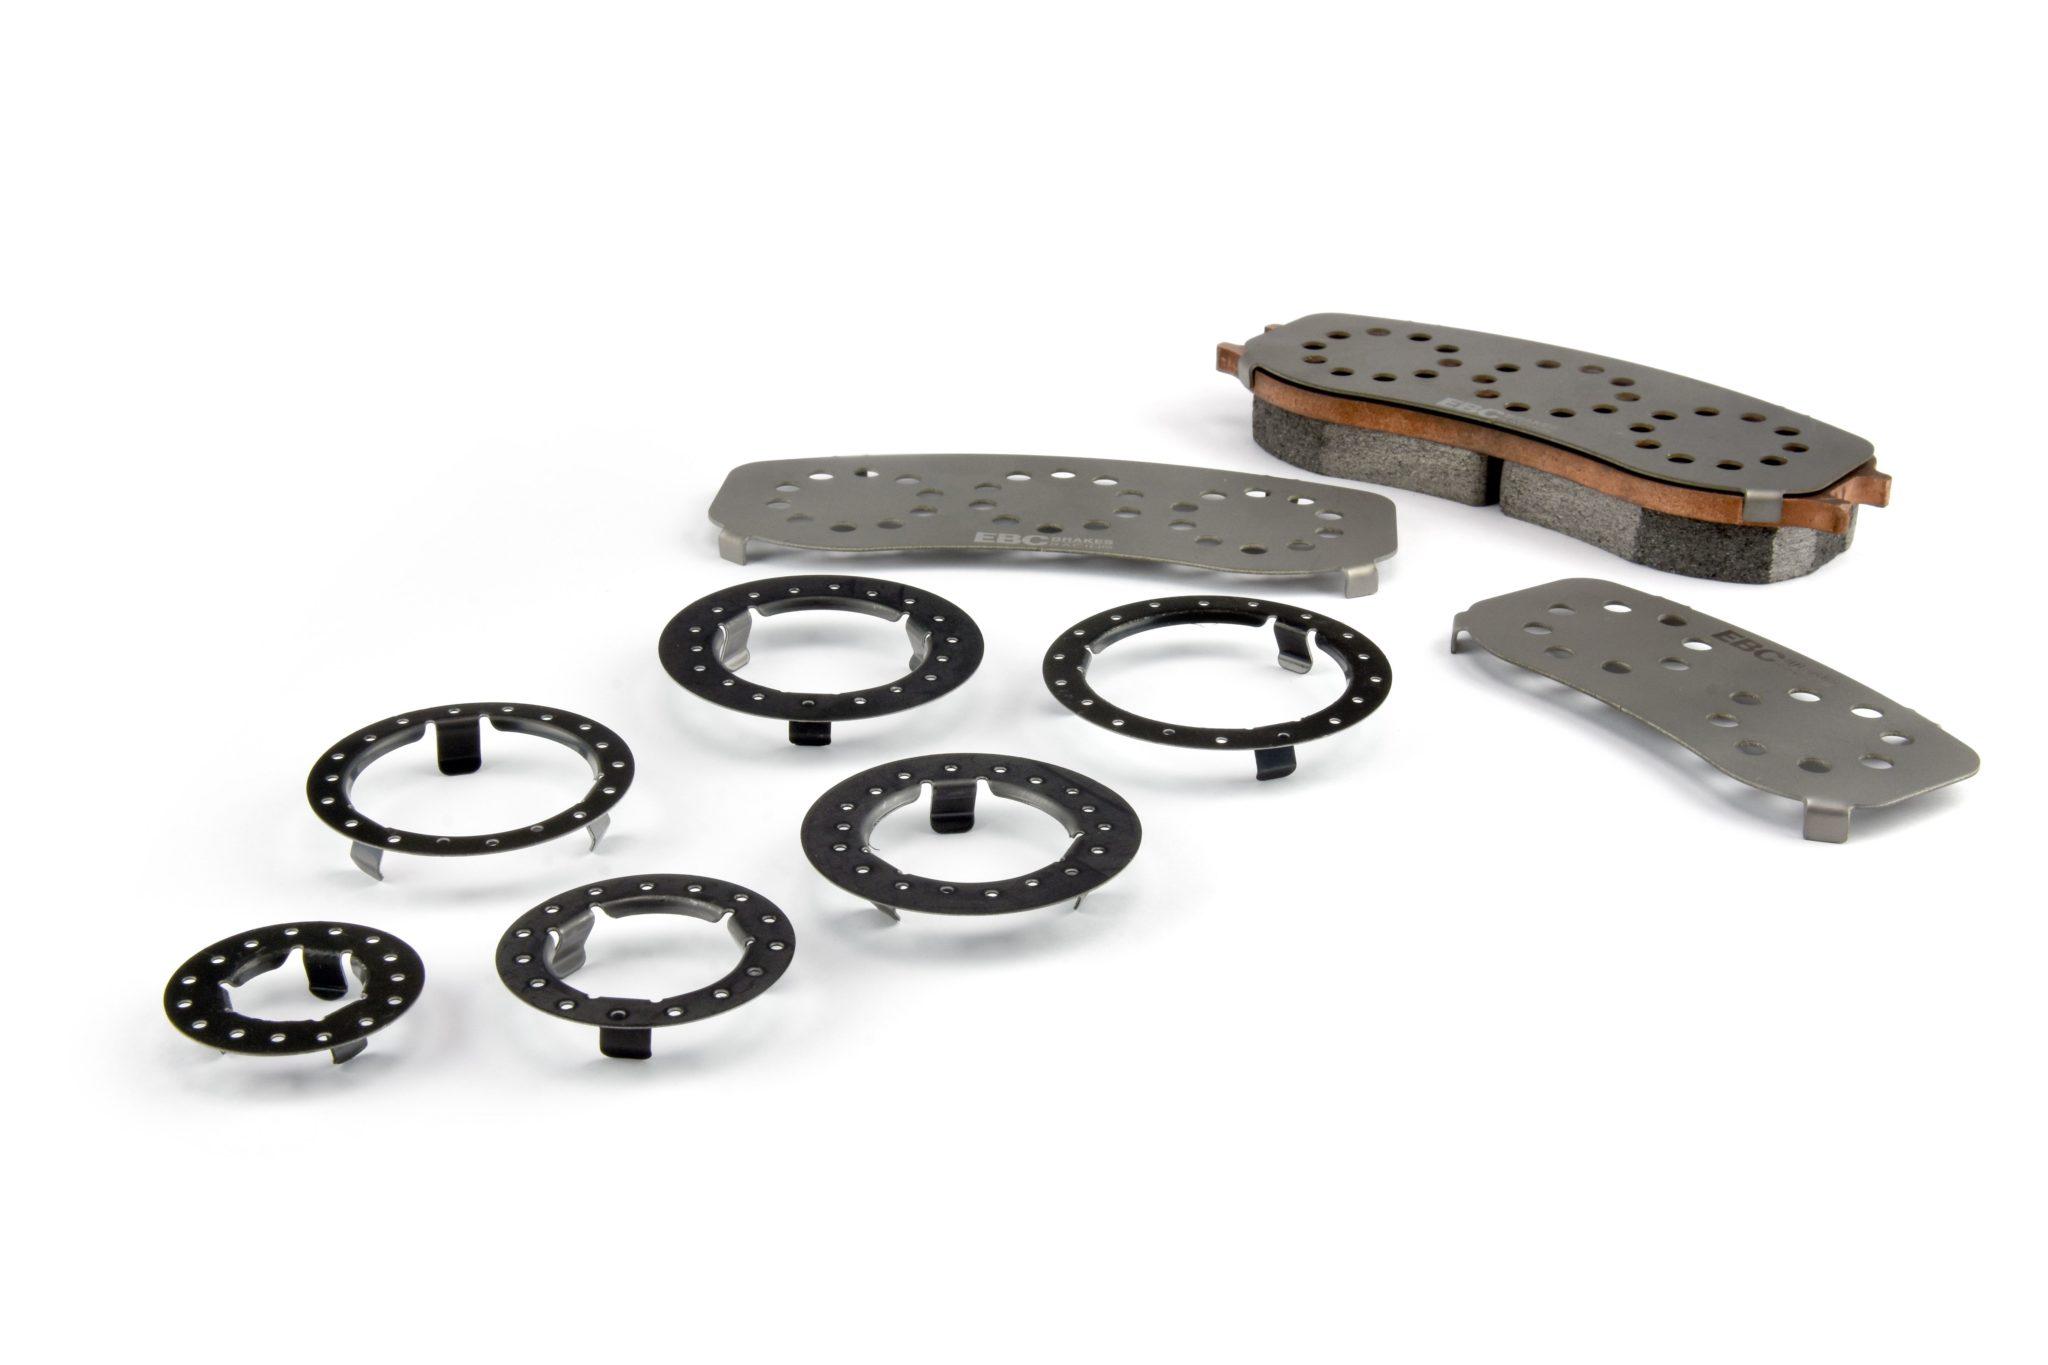 EBC Titanium Brake Pad Shims Can Reduce Caliper Overheat And Seal Damage